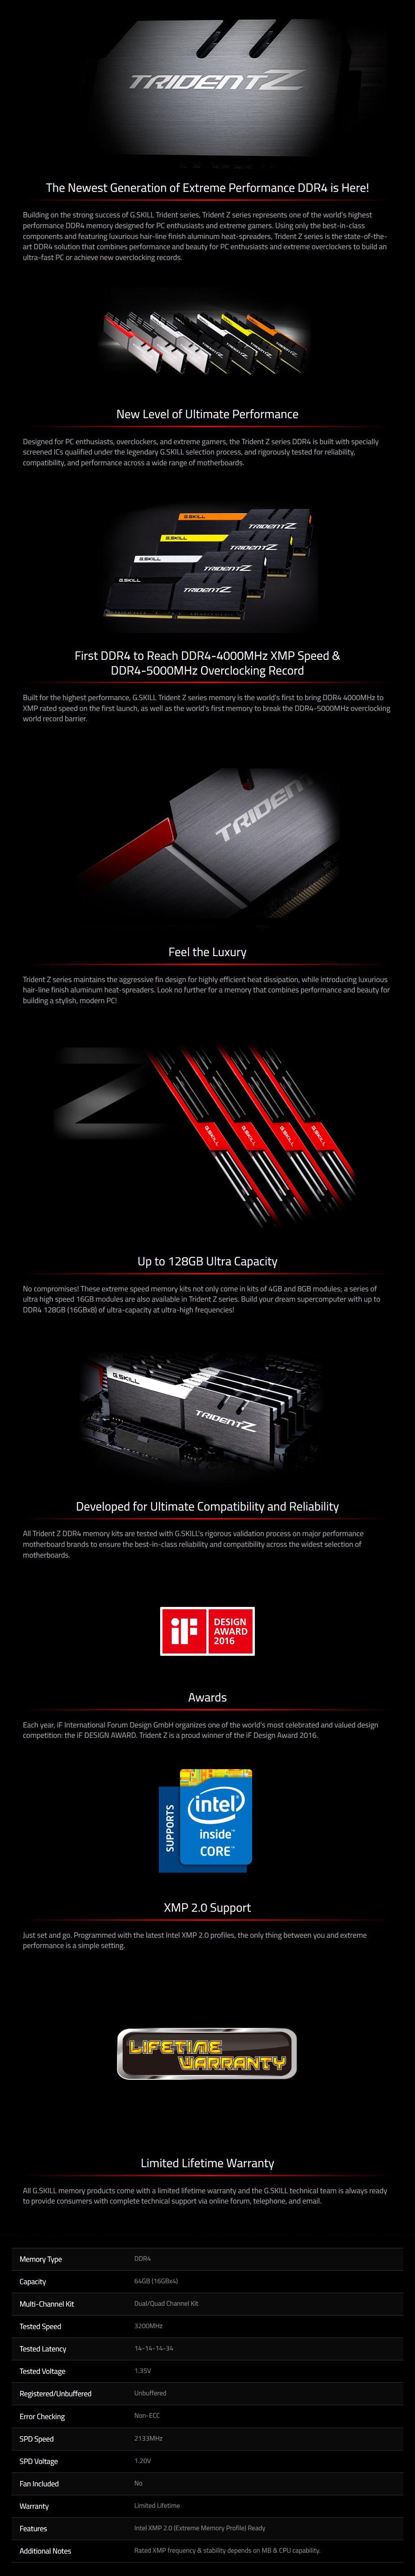 G.Skill Trident Z 64GB (4x 16GB) DDR4 3200MHz Memory - Overview 1